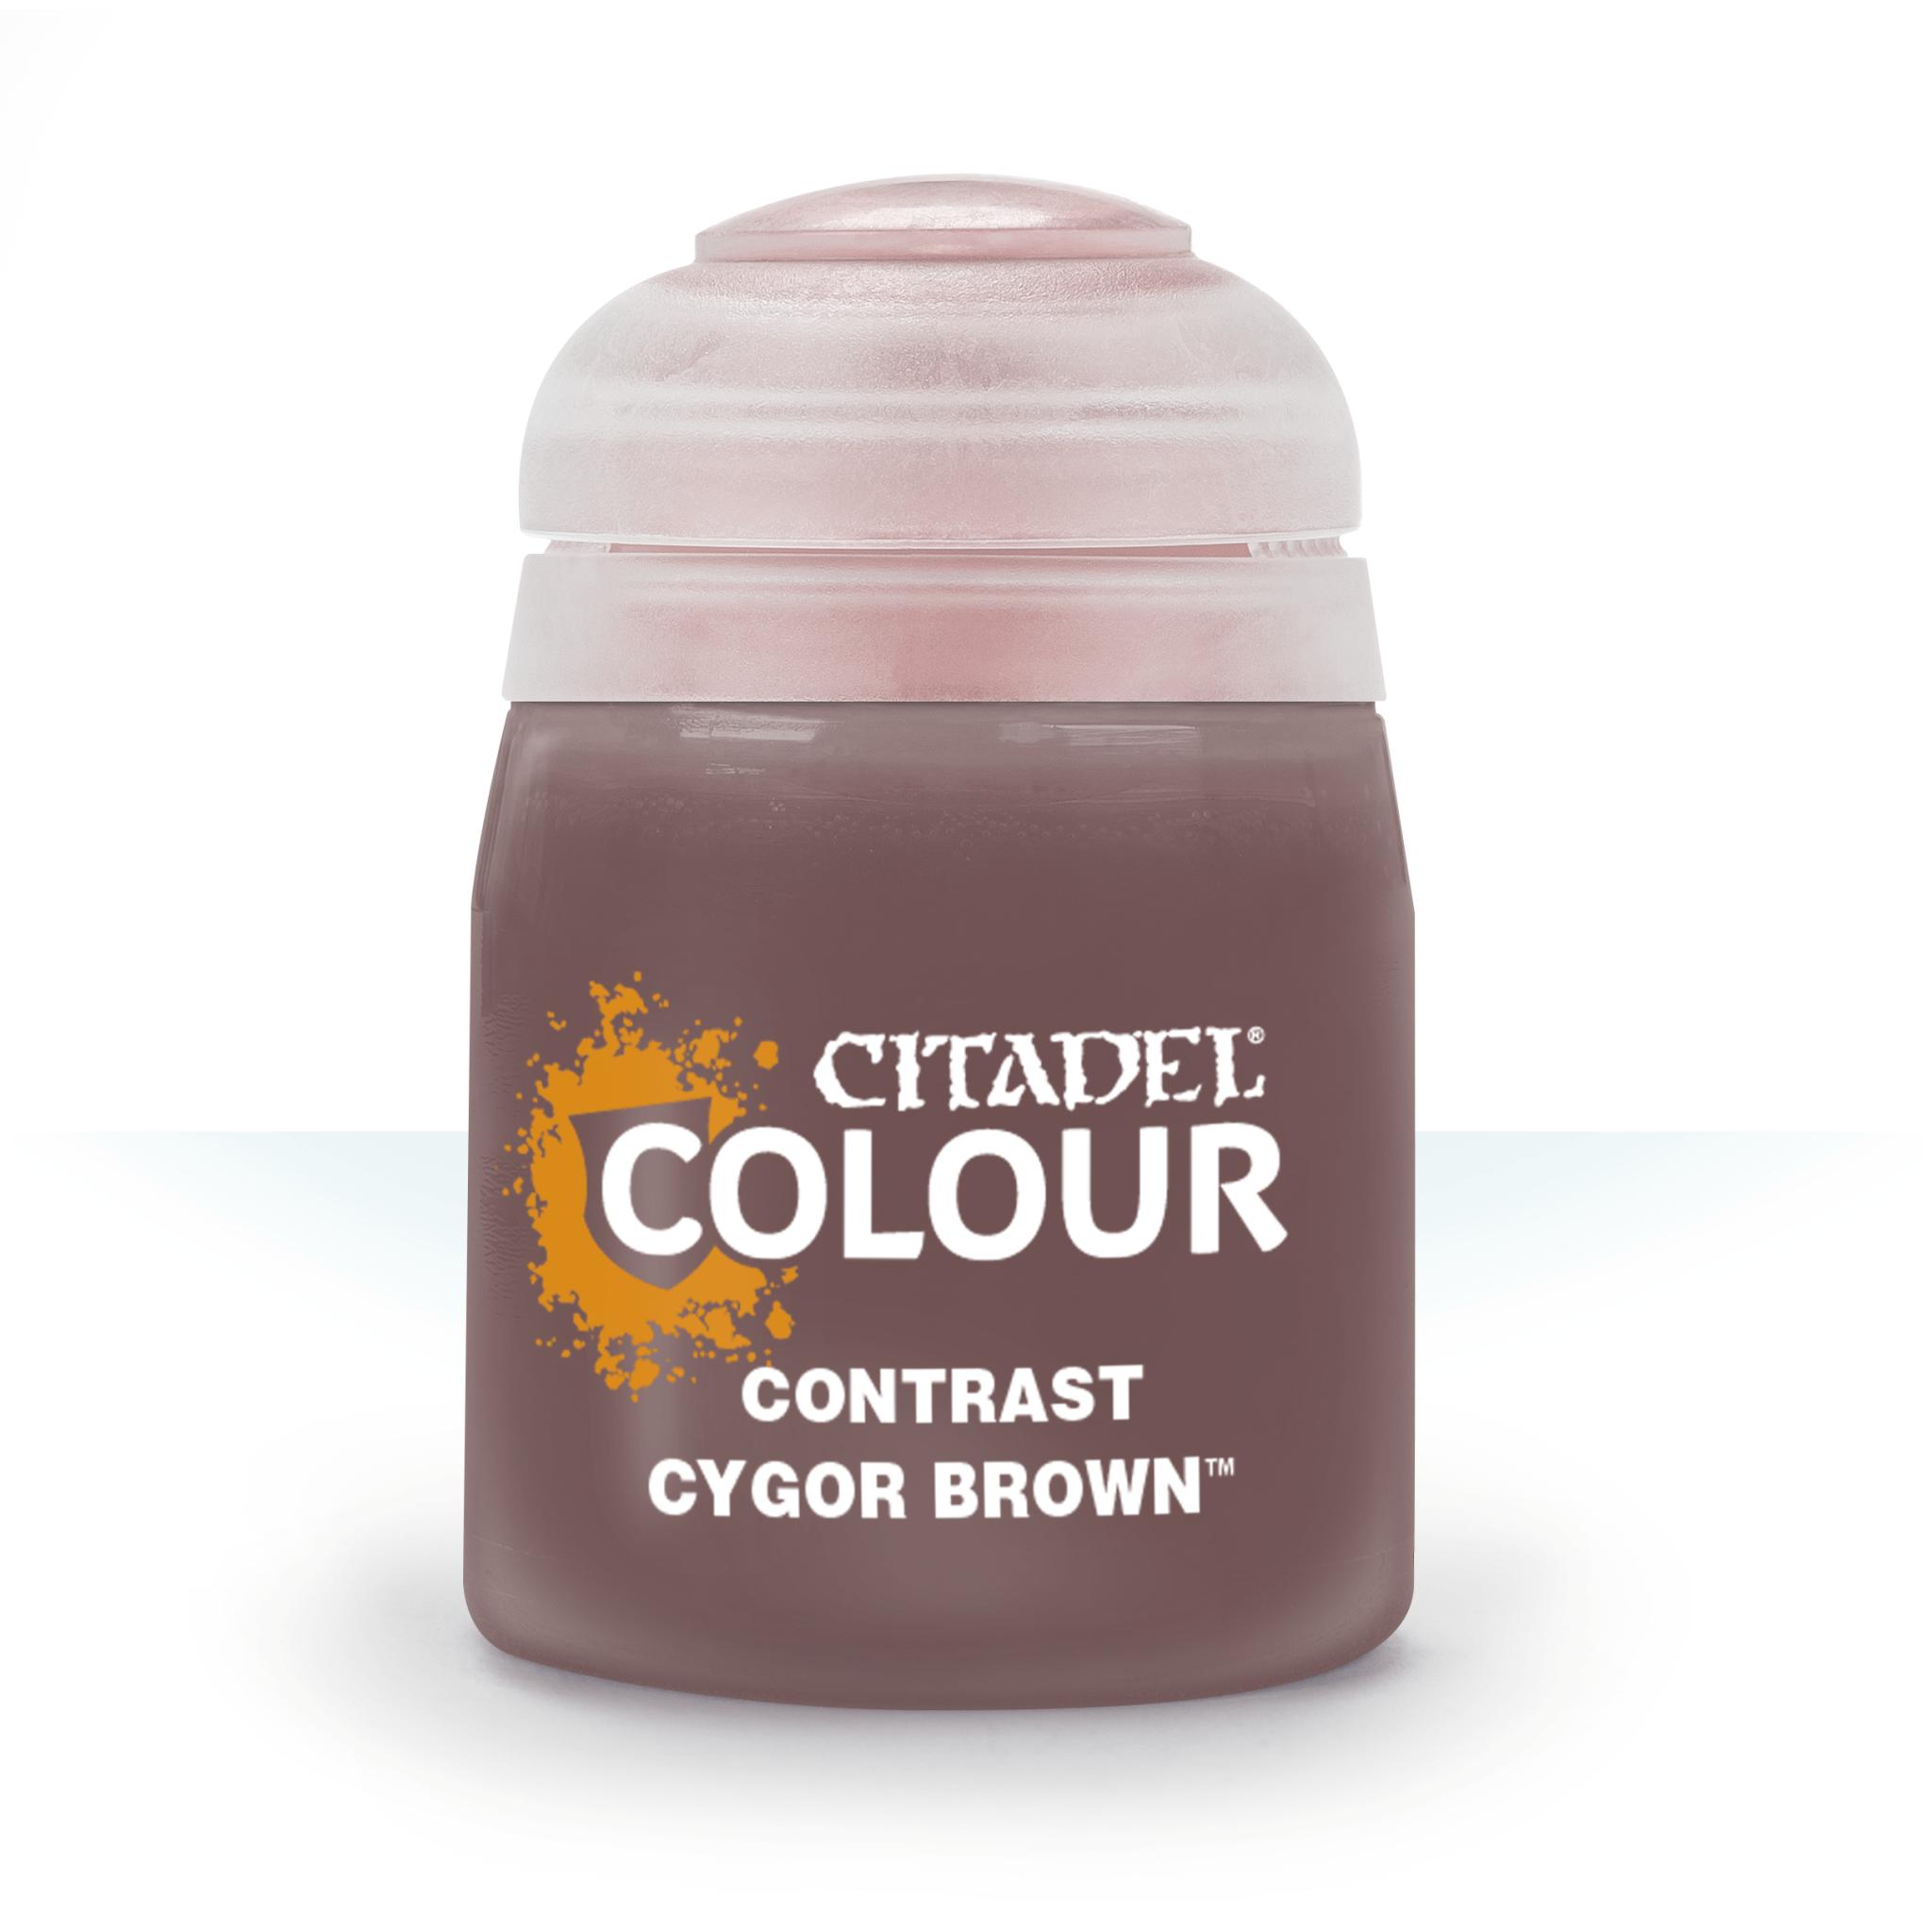 Citadel Paint Contrast: Cygor Brown